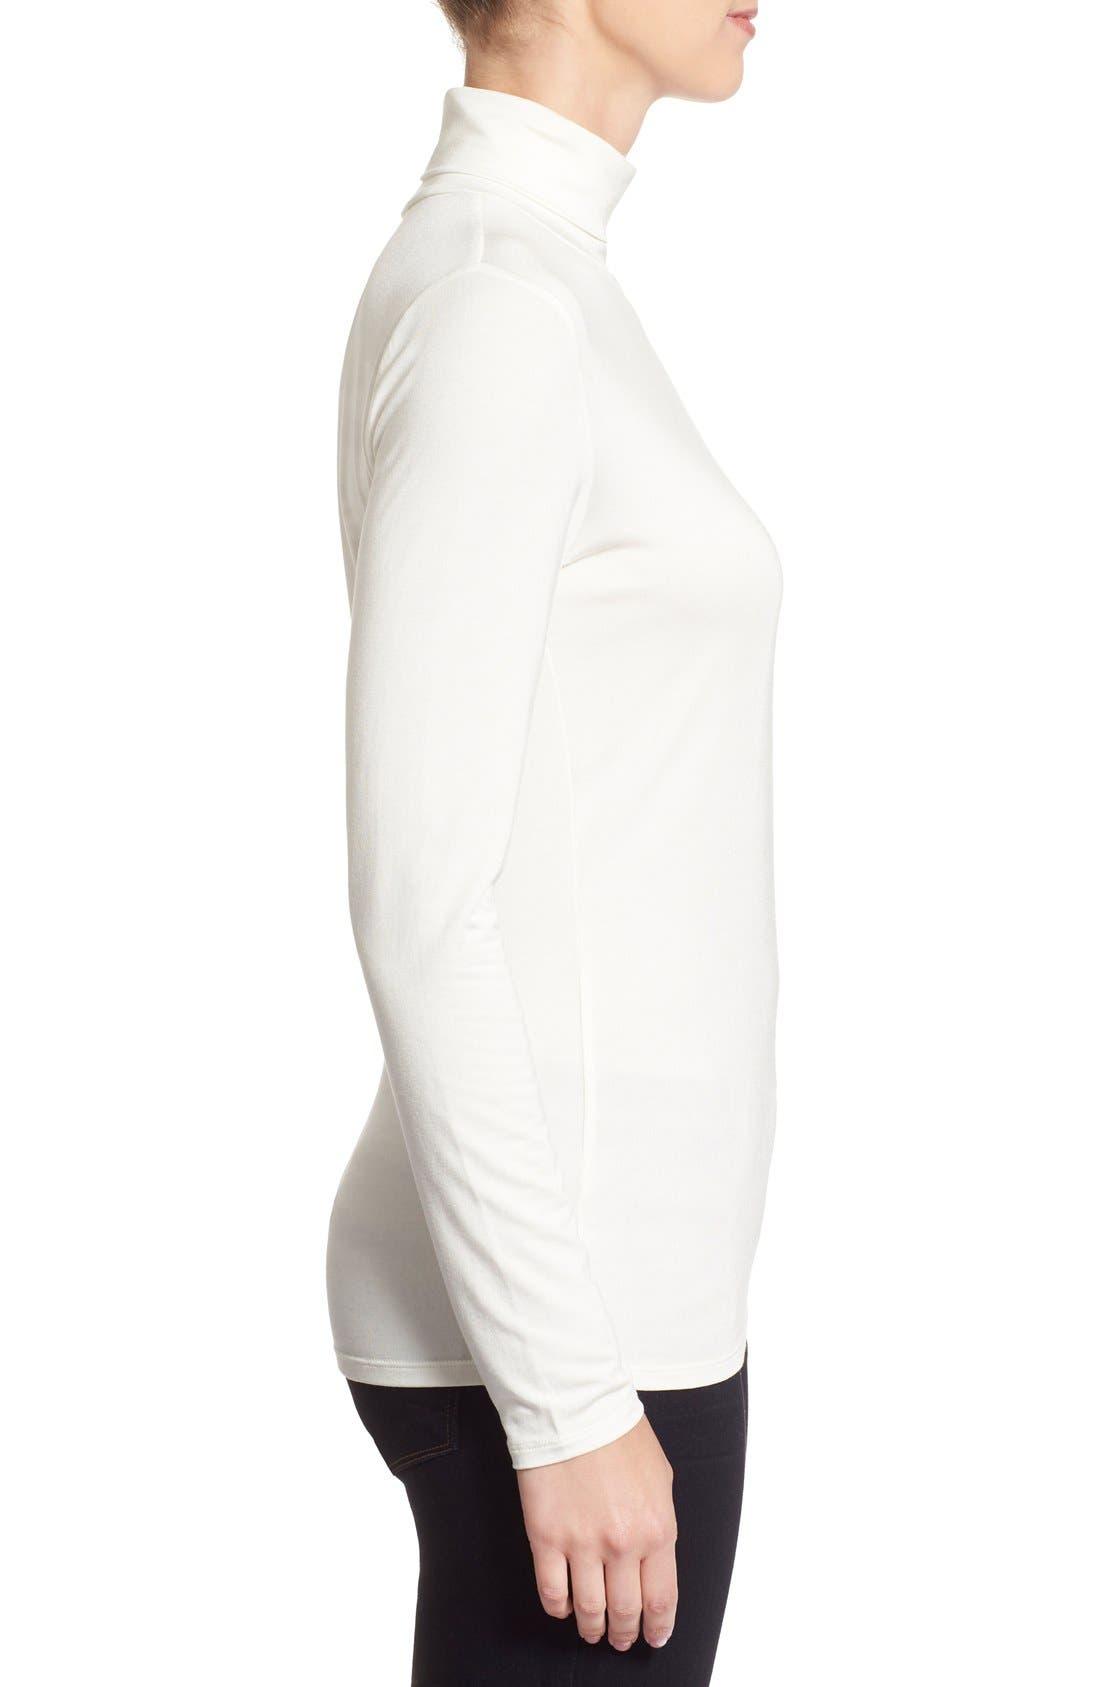 Alternate Image 3  - Nordstrom Collection 'Ultimate' Stretch Modal Turtleneck Top